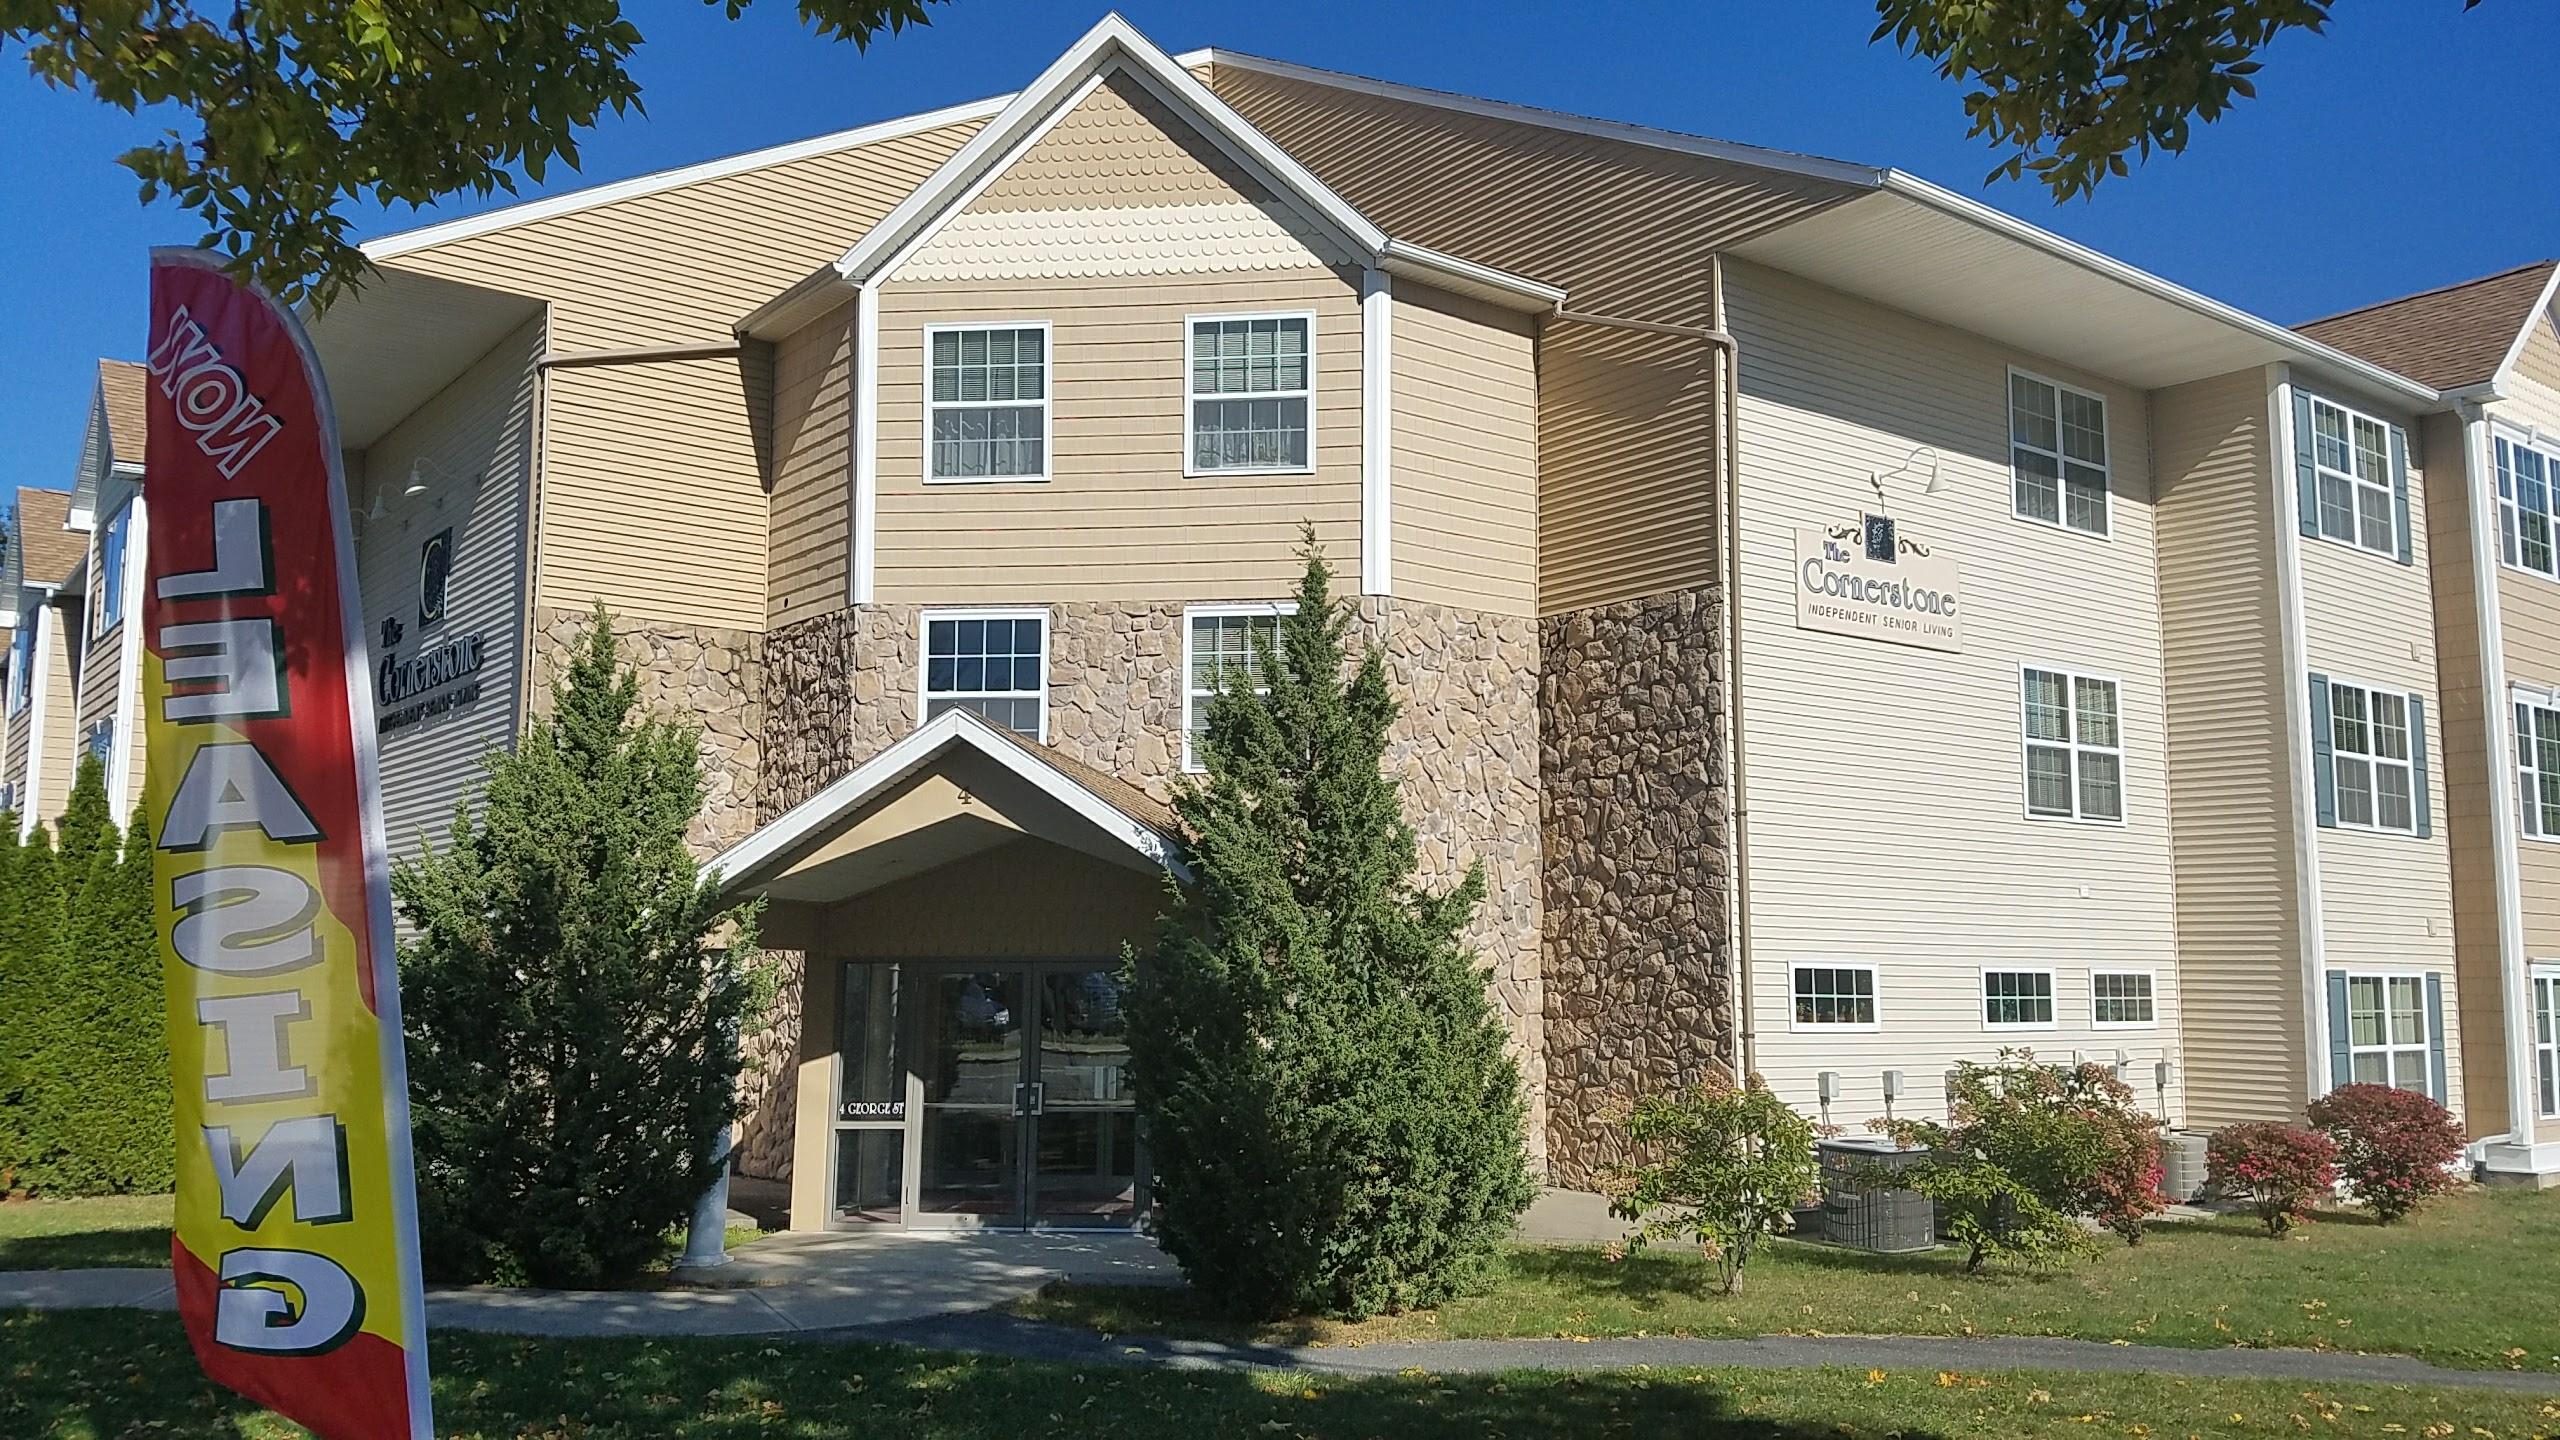 Main Entrance, Finning Cornerstone 55+ Senior Living Community Green Island NY